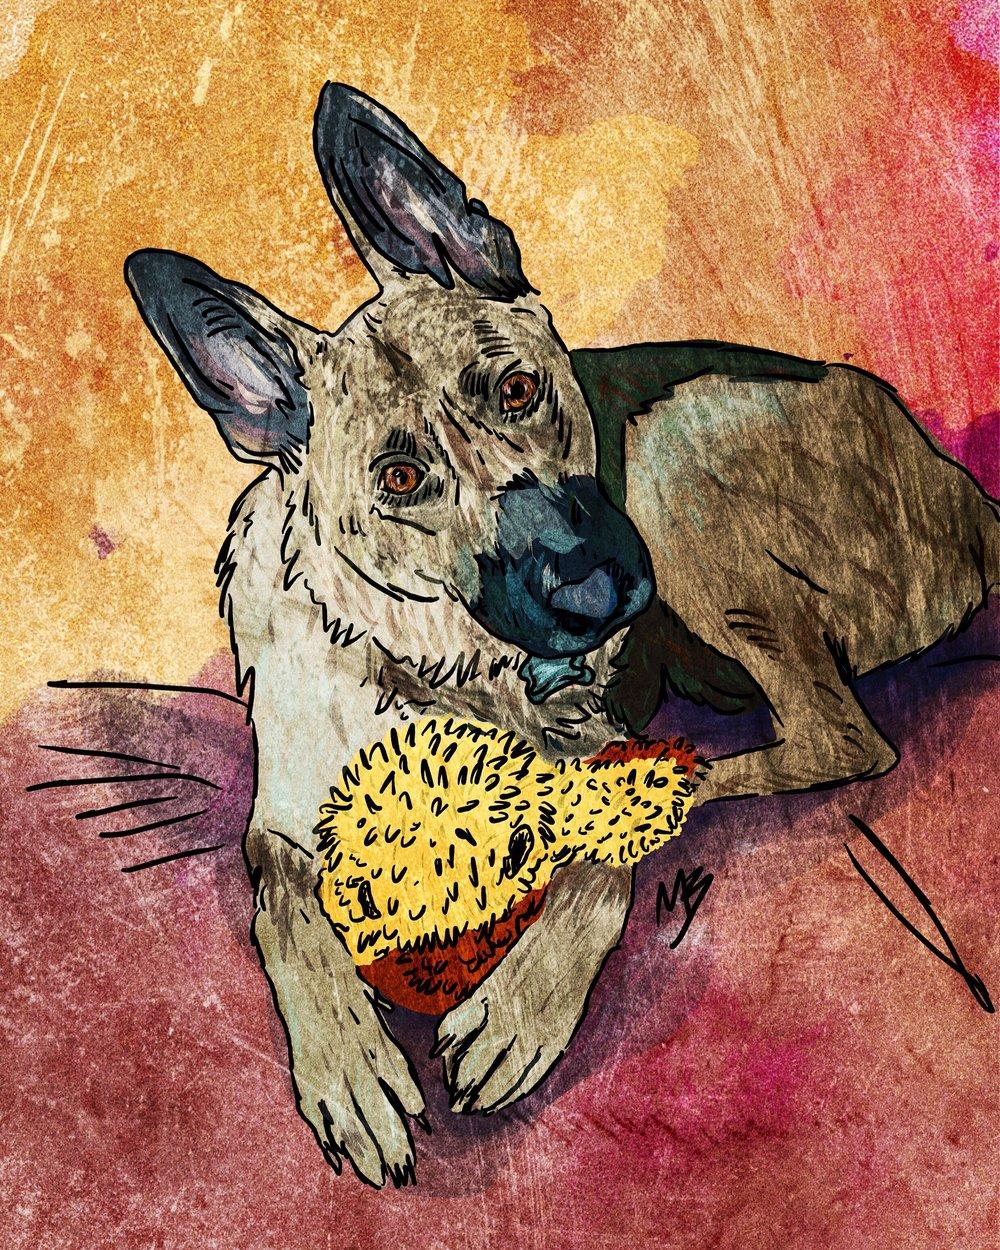 2. Your digital pet portrait created. Woof!